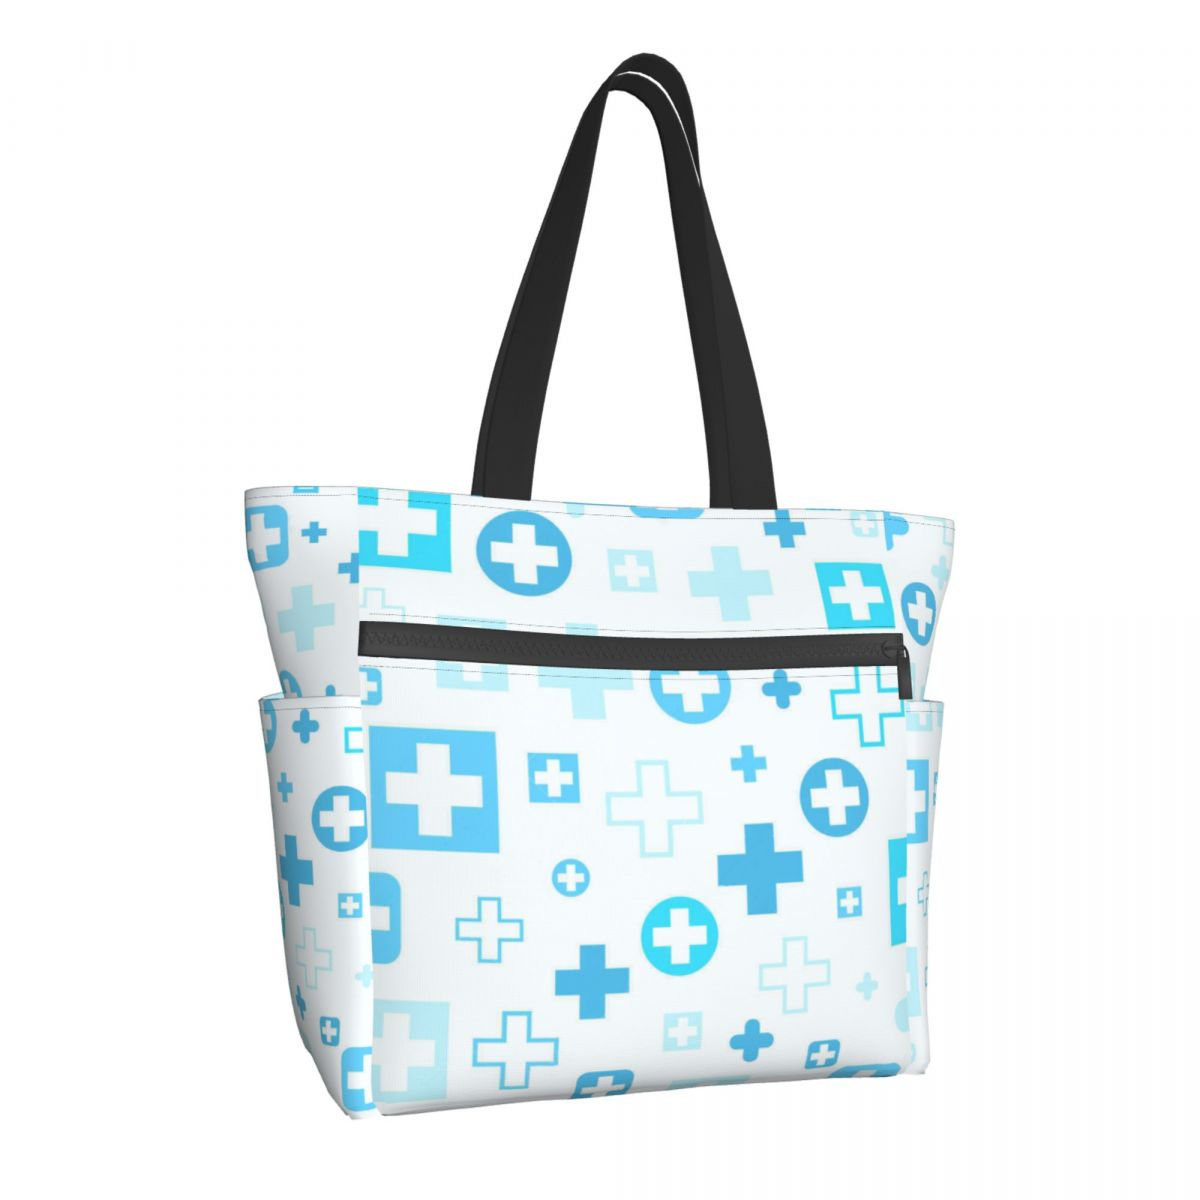 NOISYDESIGNS الكرتون ممرضة طباعة الصيف حقيبة كتف سستة حقيبة يد للتسوق عالية الجودة النساء الفتيات قماش حقيبة شاطئية كبيرة